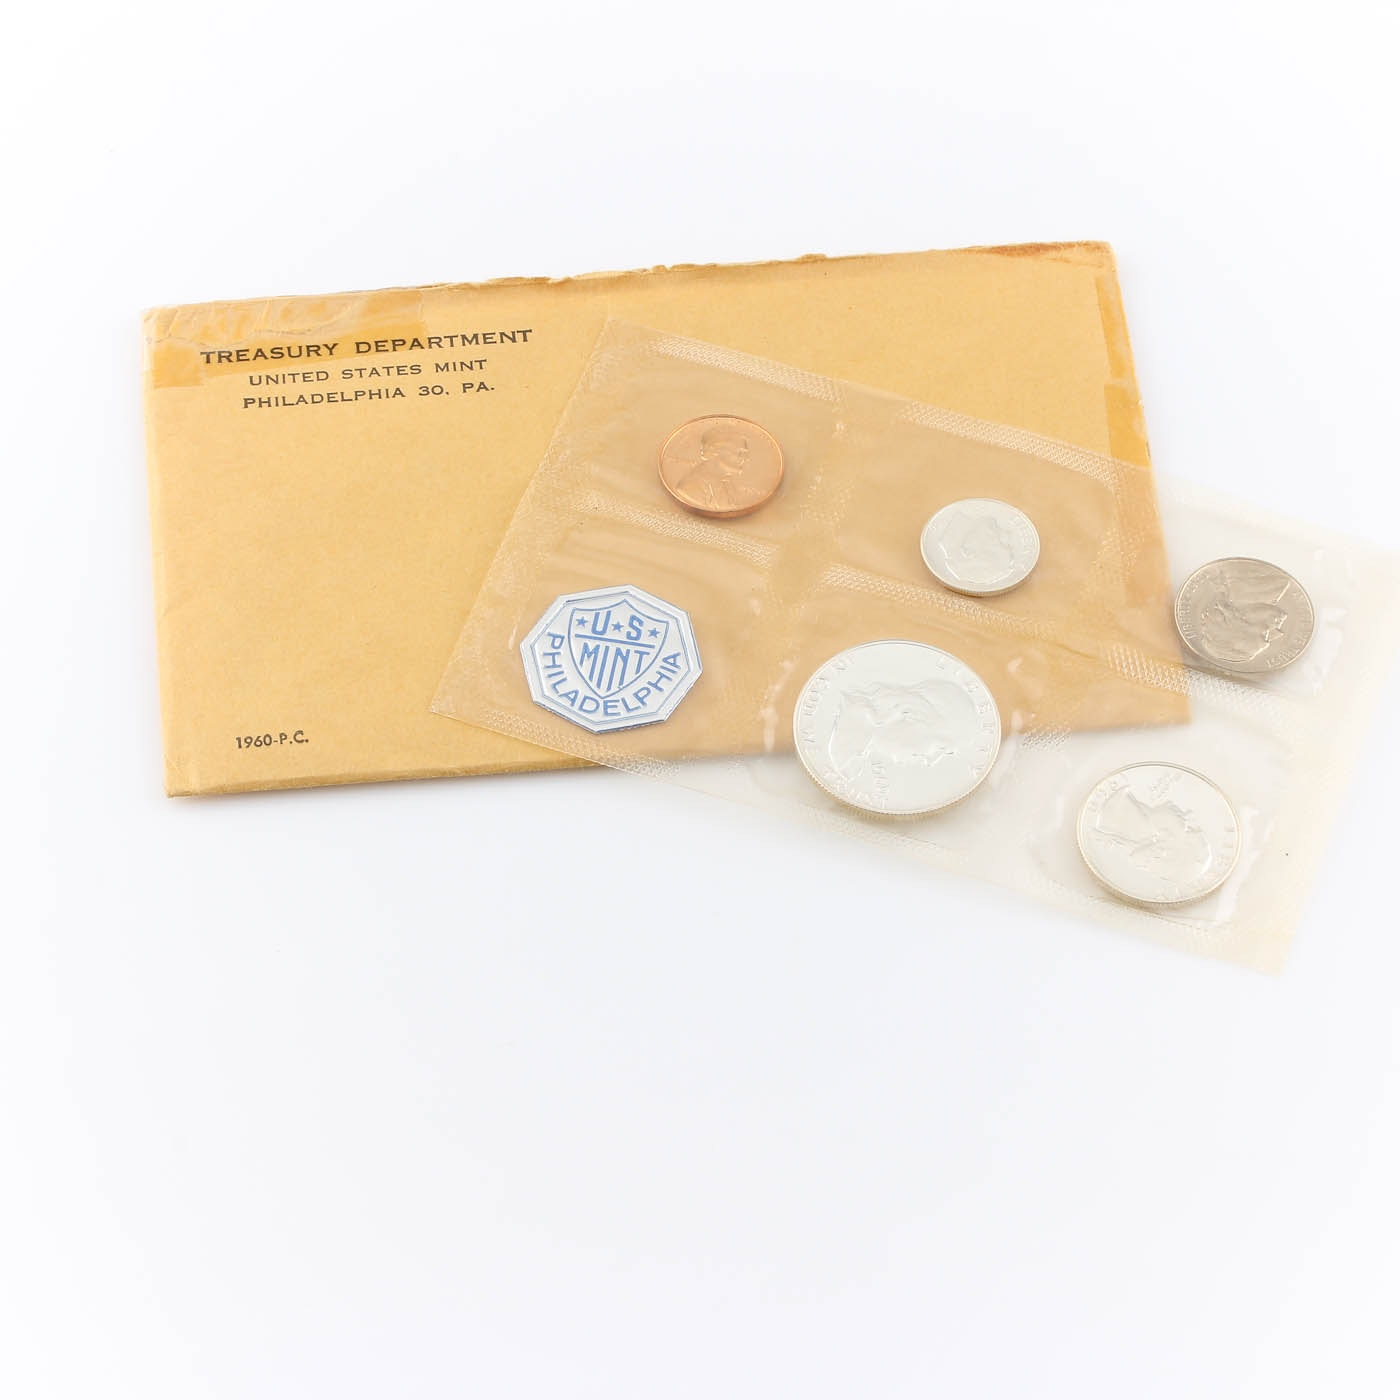 1960 U.S. Philadelphia Mint (Small Date) Proof Set